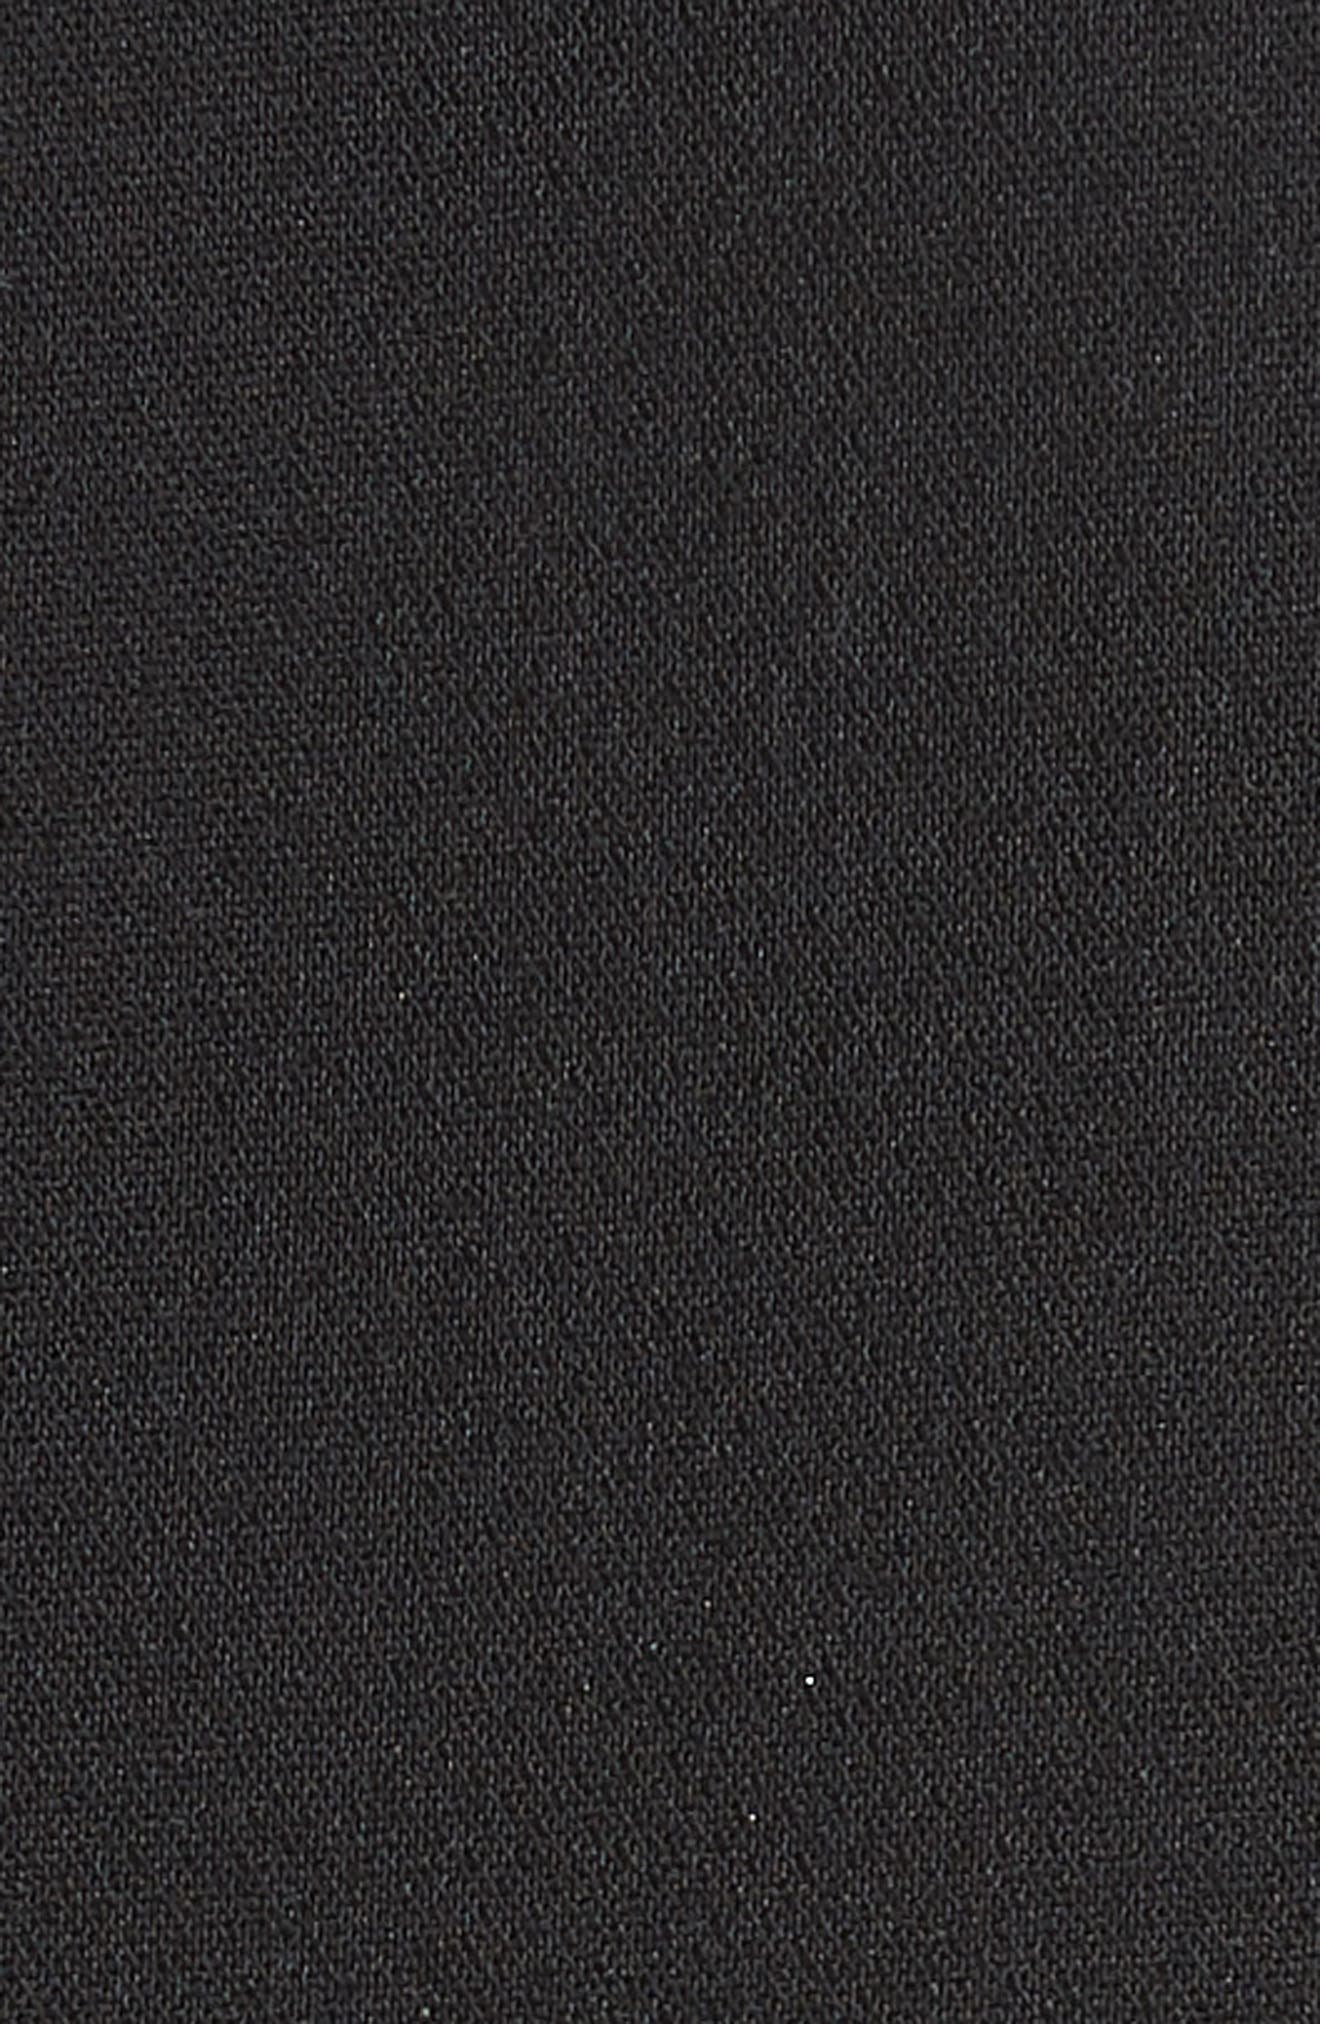 Kenzie Double Breasted Blazer,                             Alternate thumbnail 6, color,                             BLACK